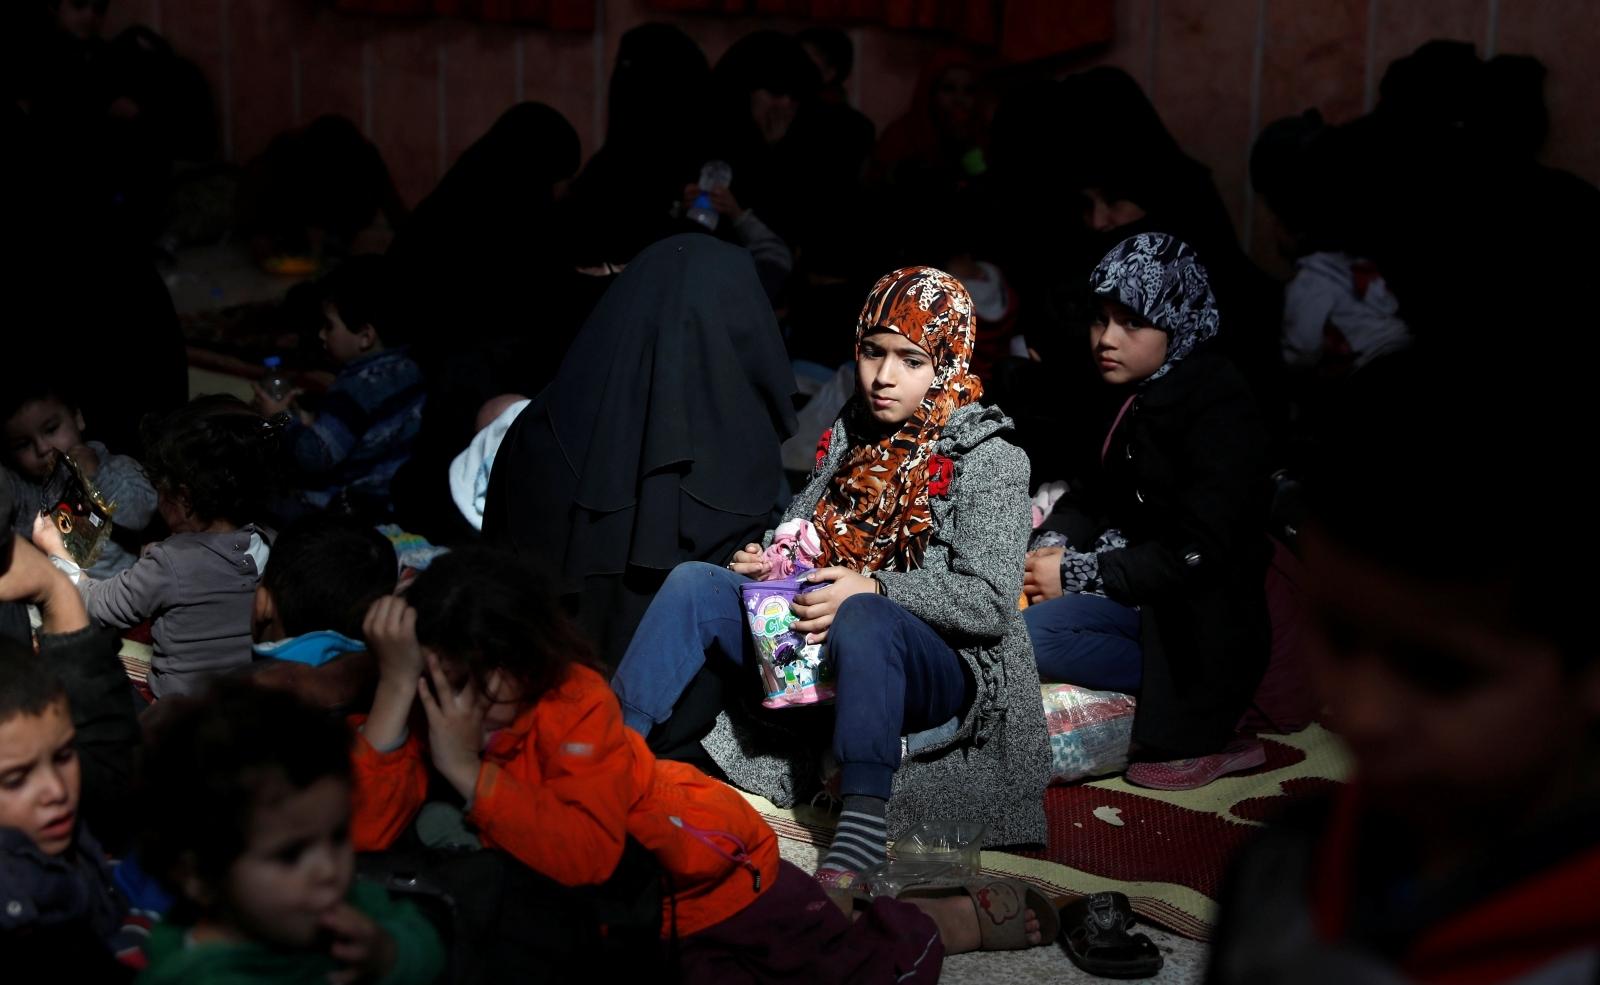 raqqa civilians